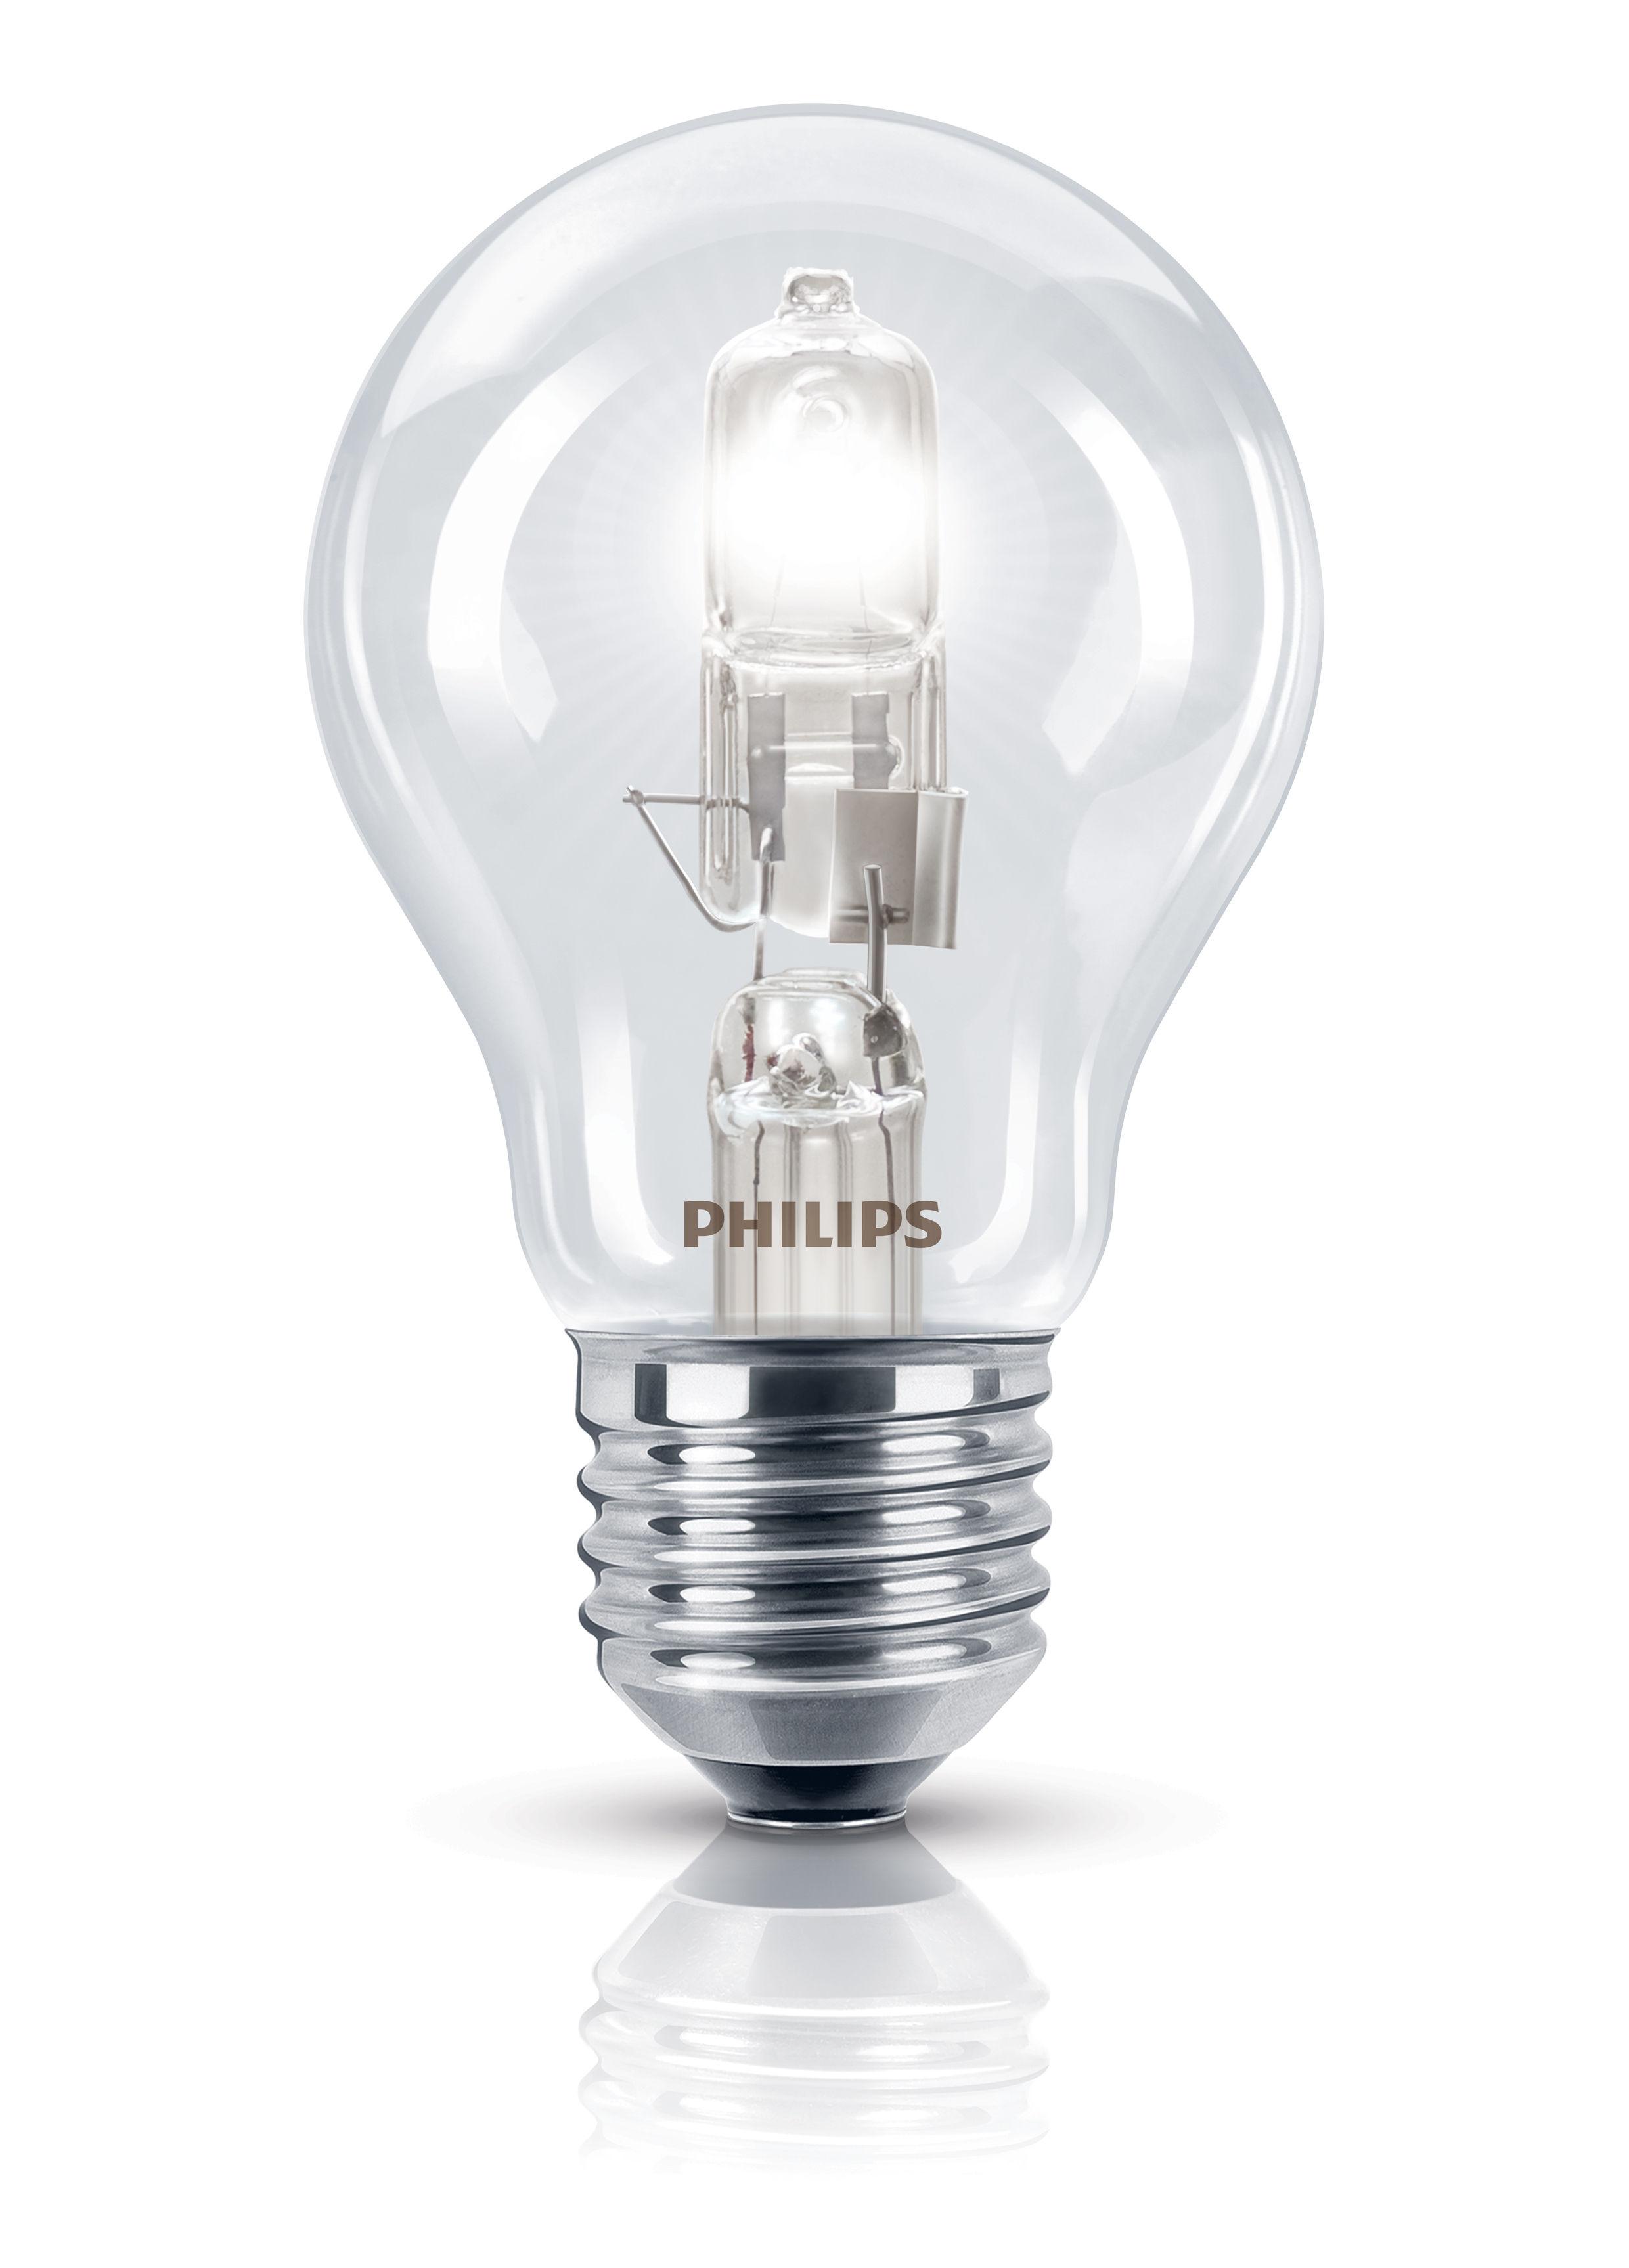 ecoclassic standard e27 eco halogen bulb 28w 35w 370 lumen 28w 35w by philips. Black Bedroom Furniture Sets. Home Design Ideas